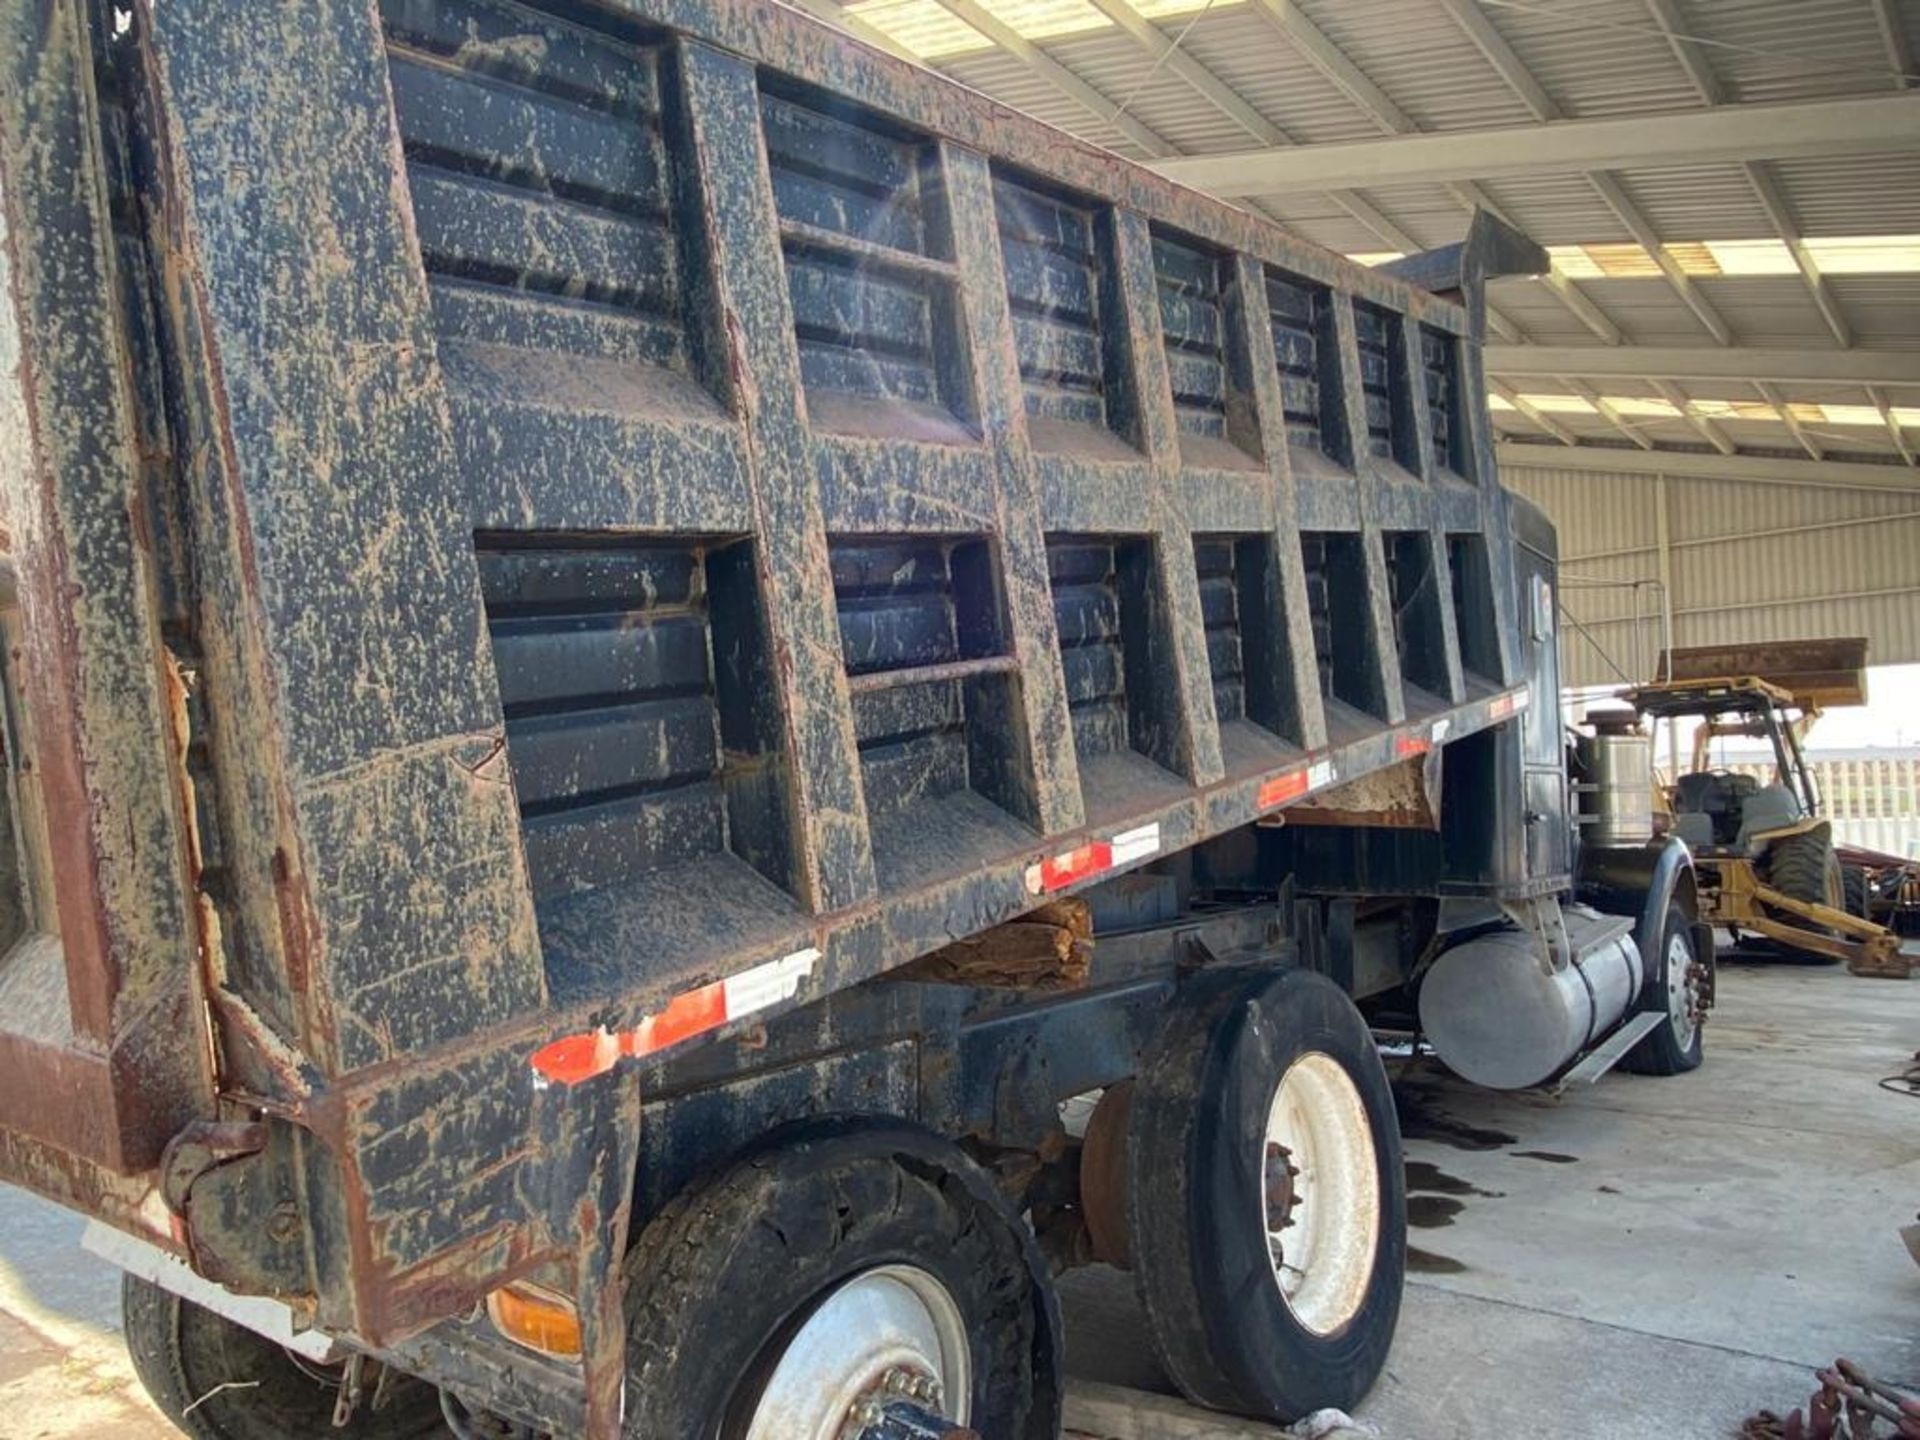 1983 Kenworth Dump Truck, standard transmission of 10 speeds, with Cummins motor - Image 20 of 68